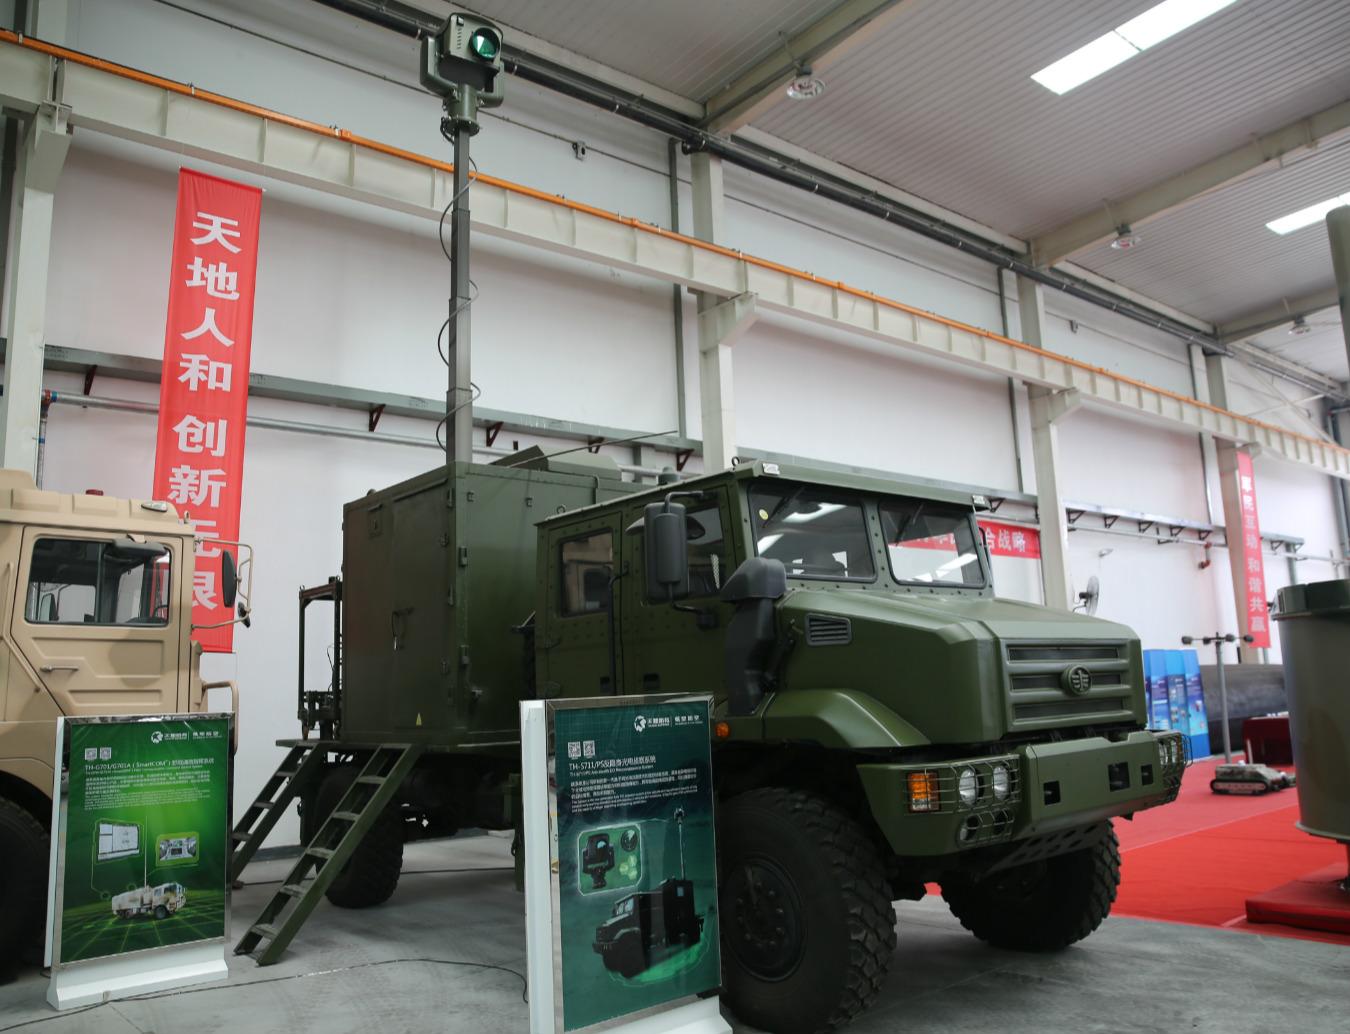 TH-S711/PS反隱身光電偵察系統